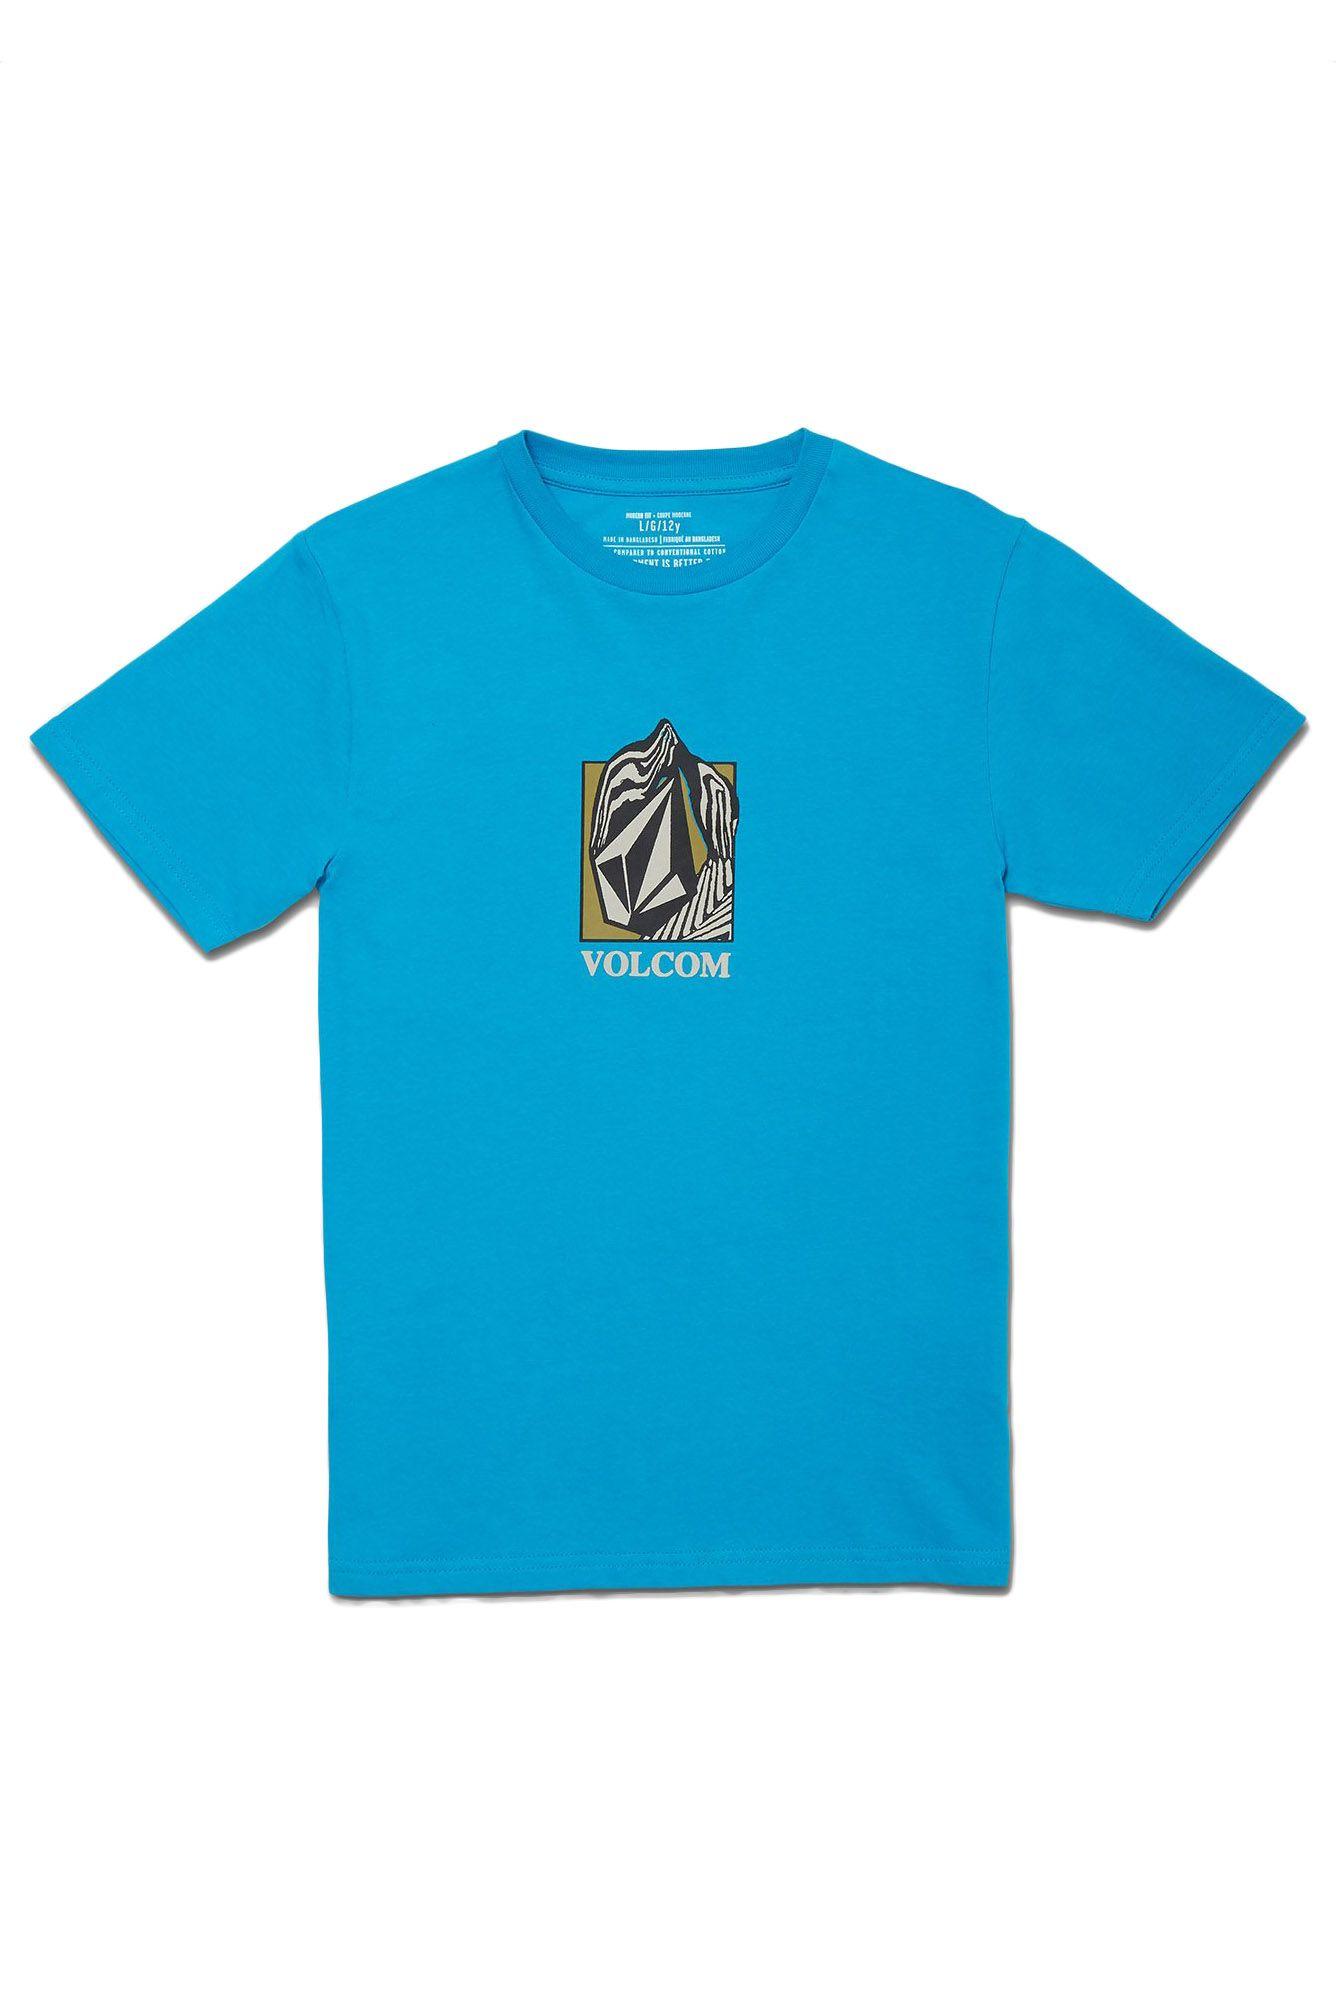 Volcom T-Shirt CROSTIC BSC SS Barrier Reef